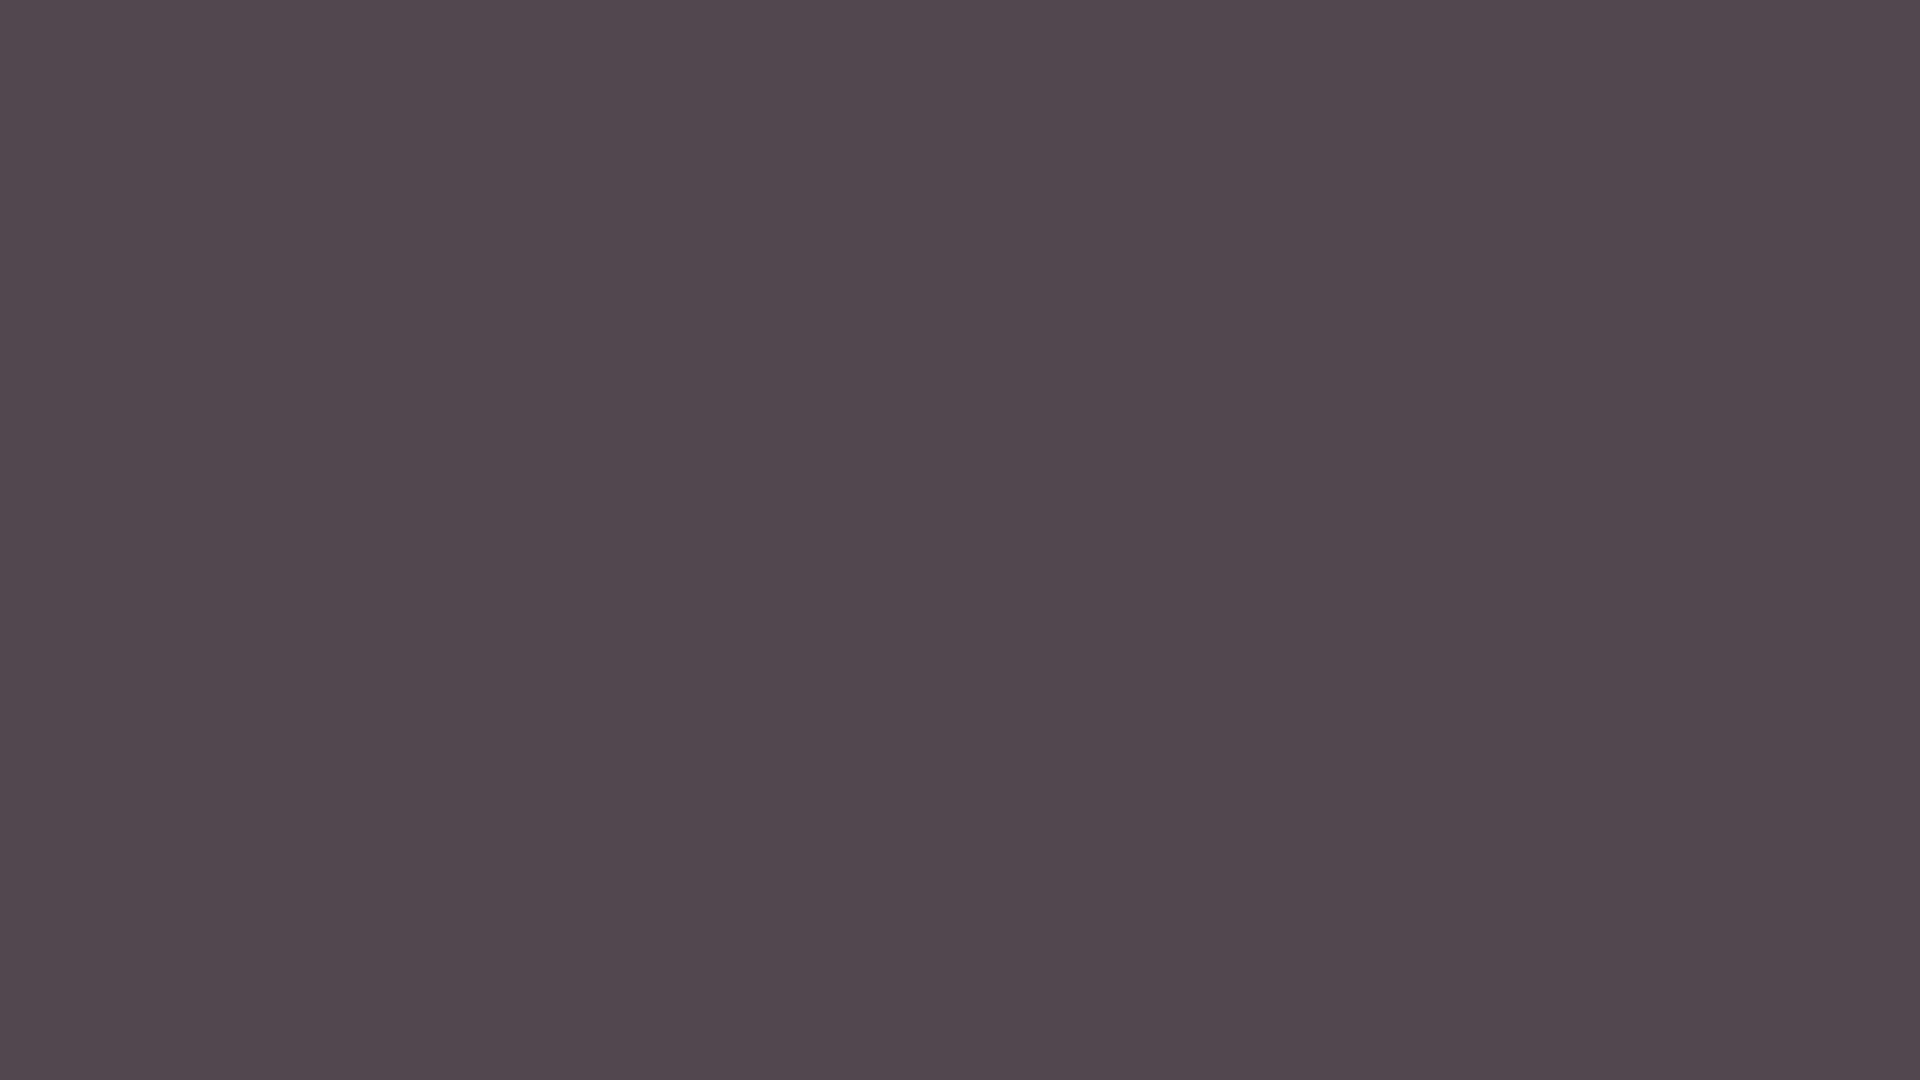 Res: 1920x1080, Quartz-Solid-Color-Background-wallpaper-wpt1008182